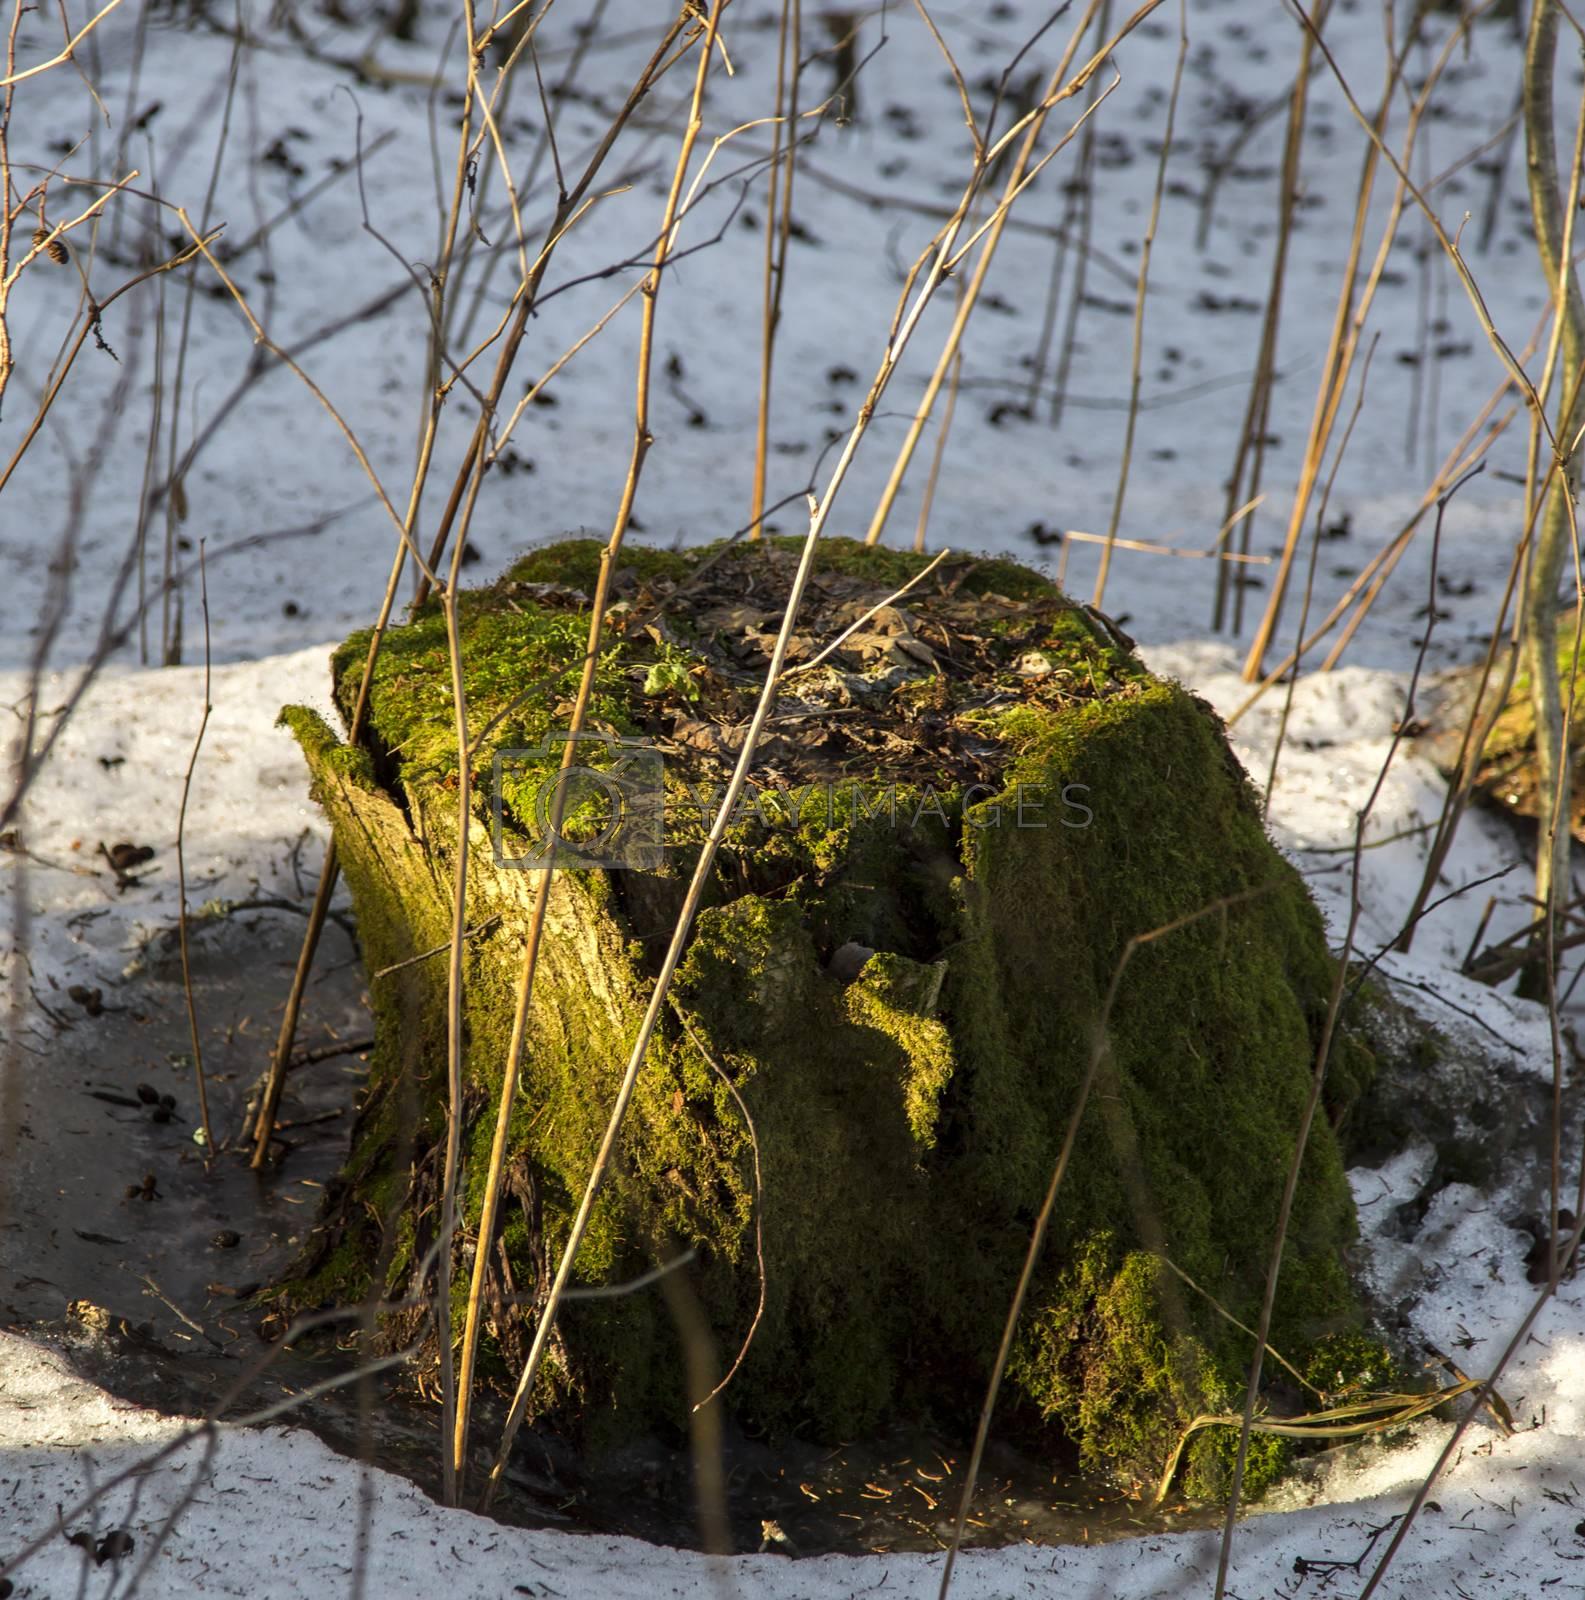 Mossy Stump with snow surrounding it.